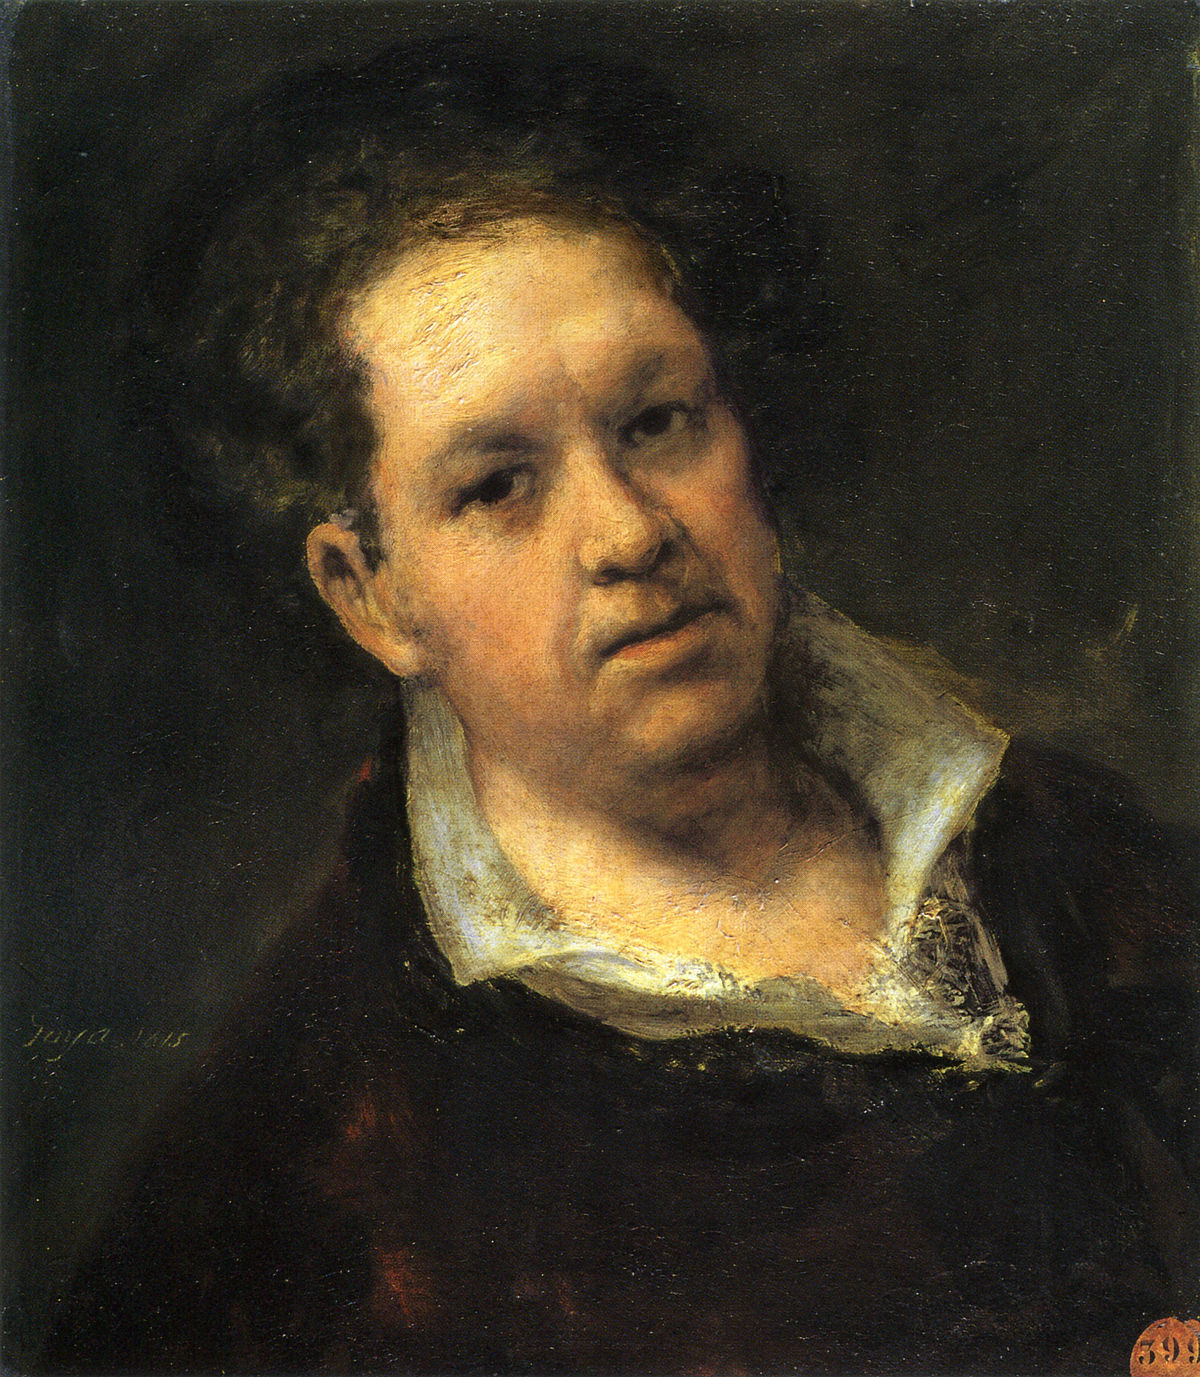 Self-portrait at 69 Years by Francisco de Goya.jpg